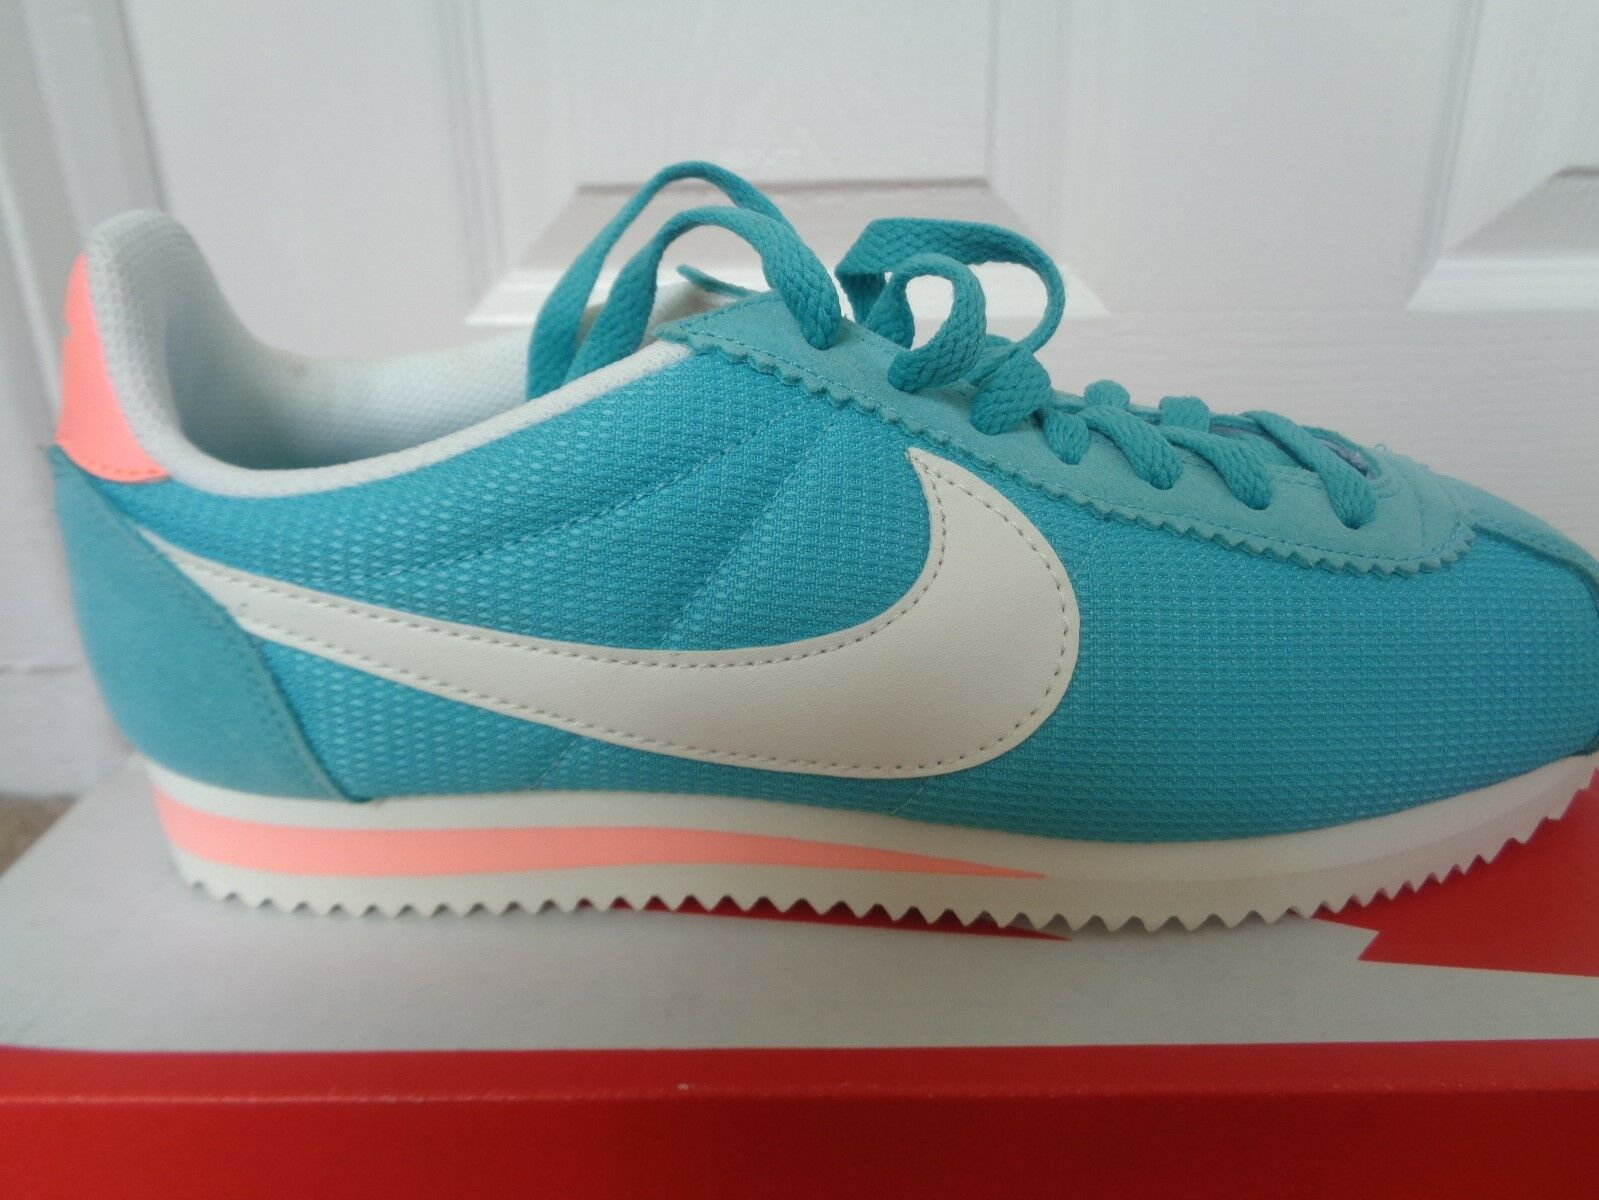 Nike Classic Cortez femmes  trainers sneakers 844892 310 uk 6 eu 40 us 8.5 NEW +BOX